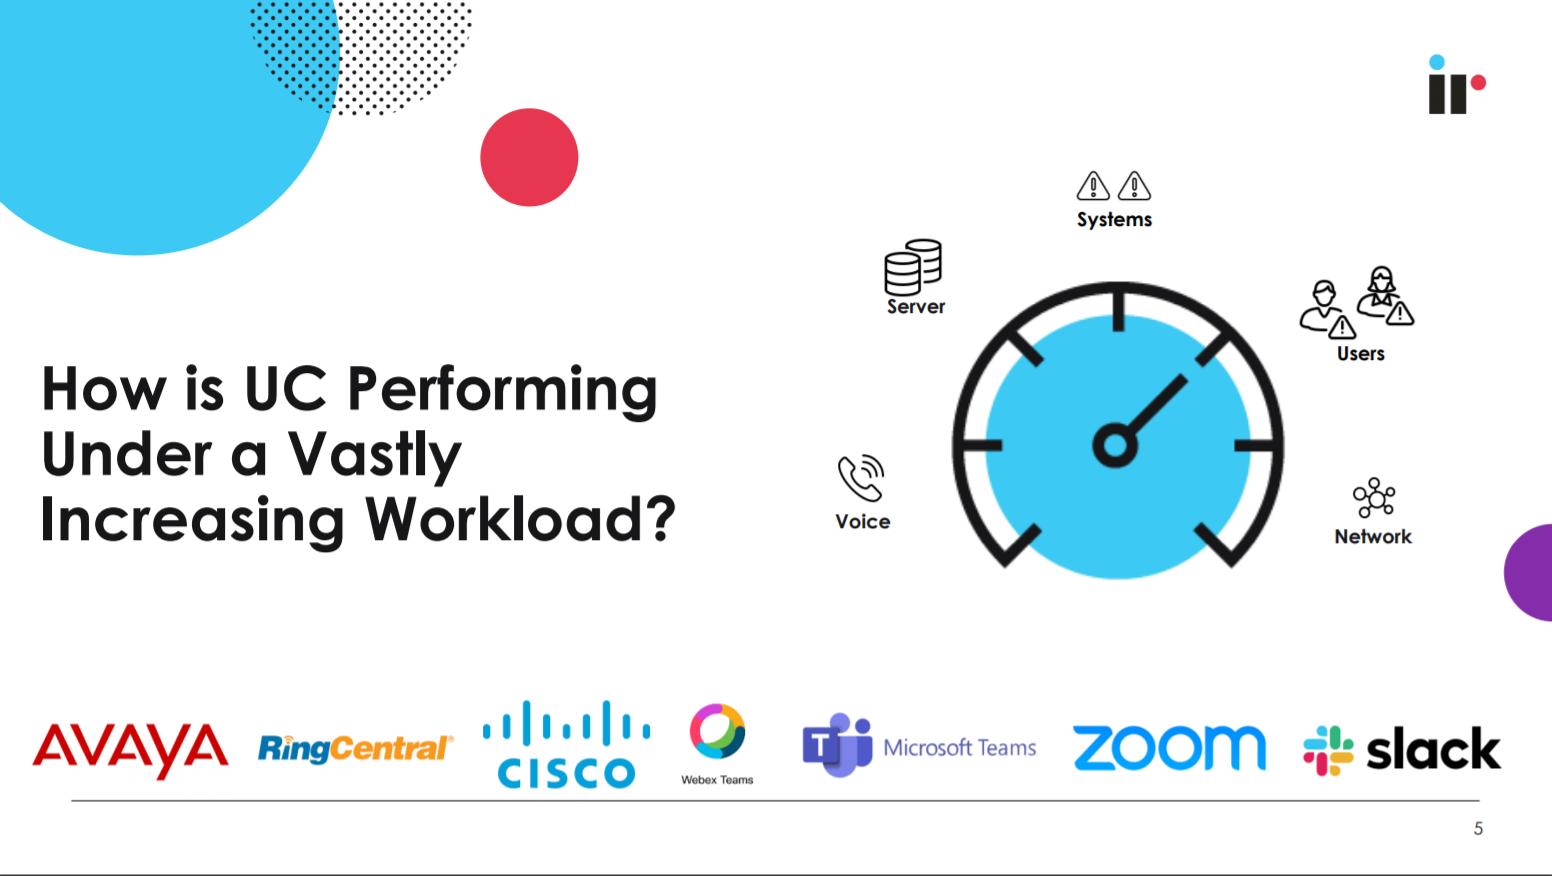 How is UC performing under vastly increasing workload.